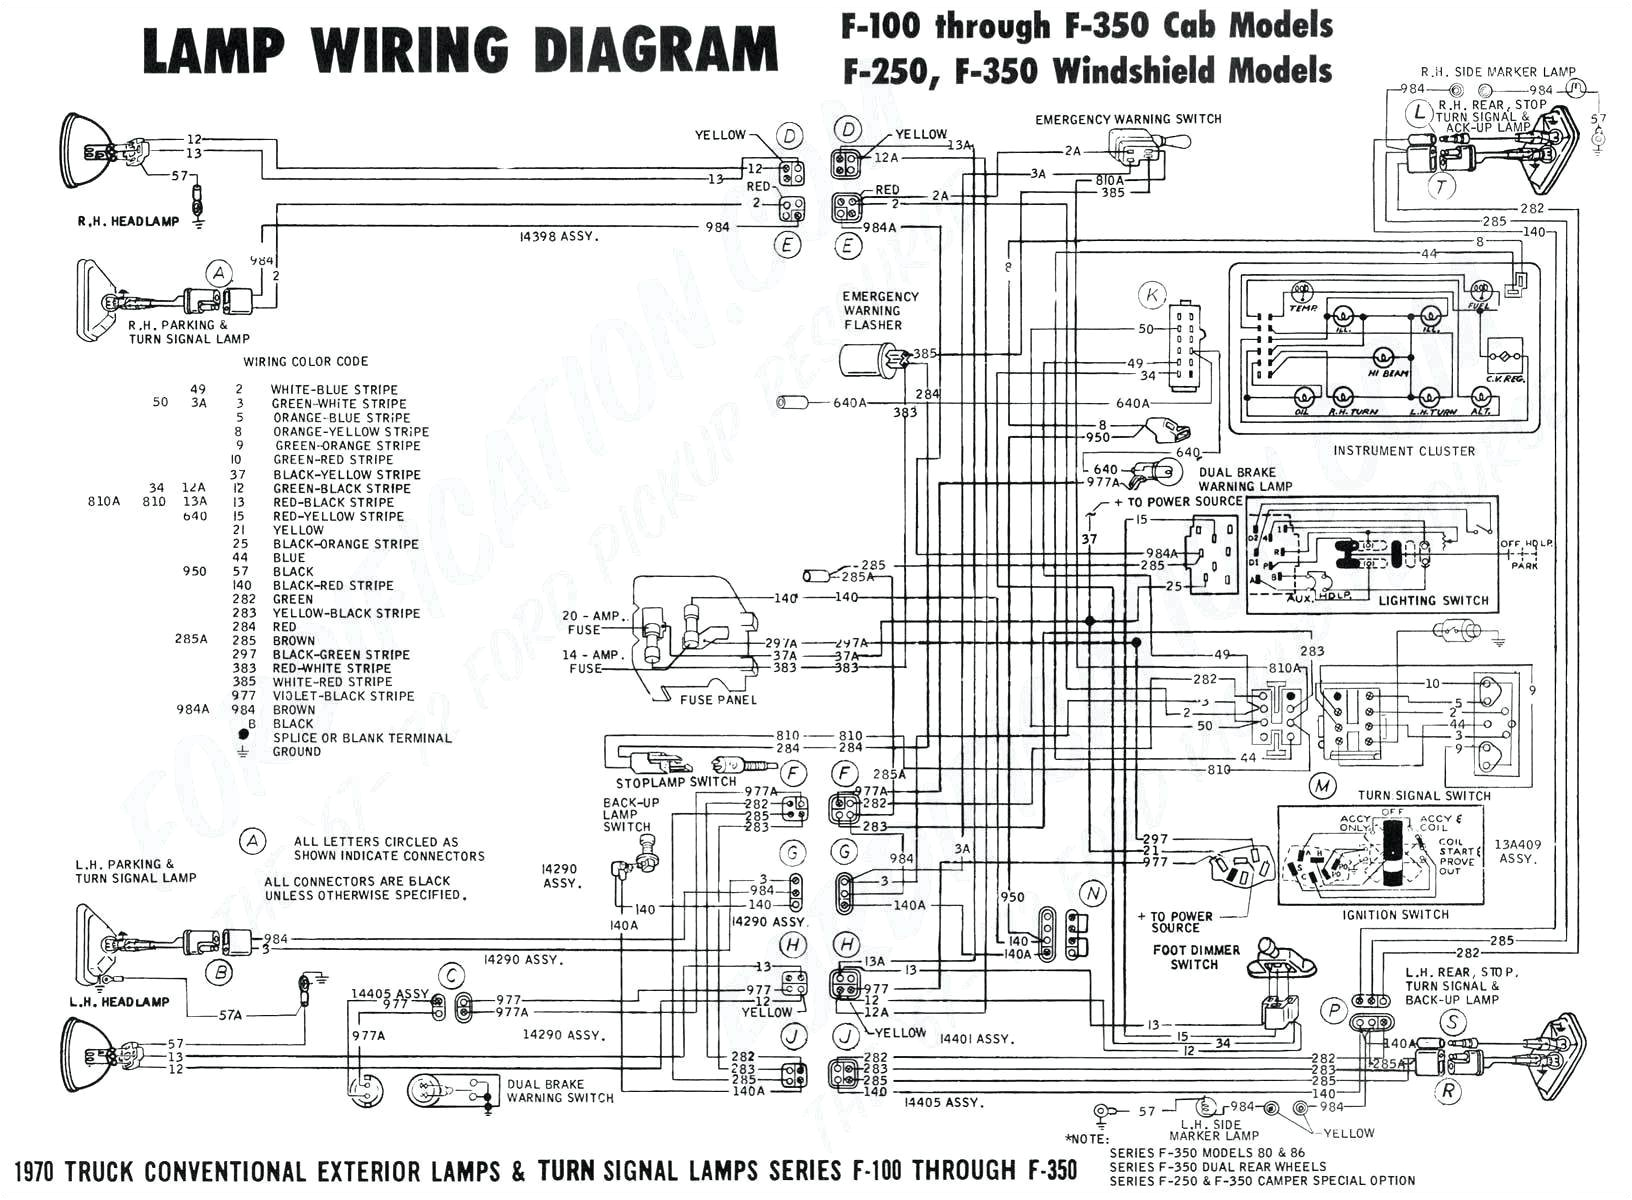 1969 Camaro Wiring Harness Diagram Diagram Furthermore Painless Wiring Harness Diagram Moreover 1967